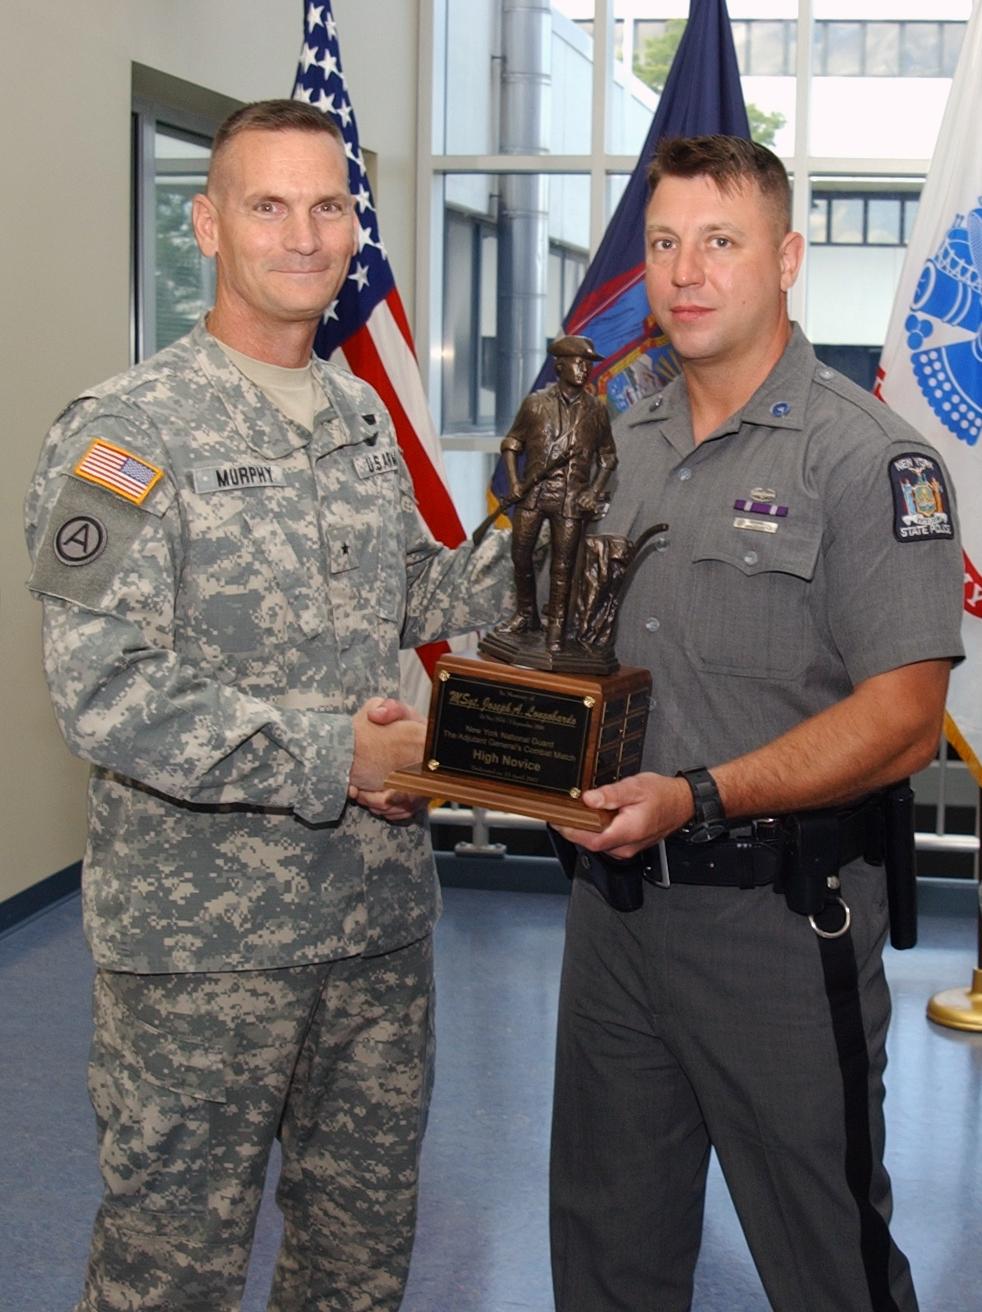 New York State Trooper and Air Guardsman Edward Stefik and Brig Gen